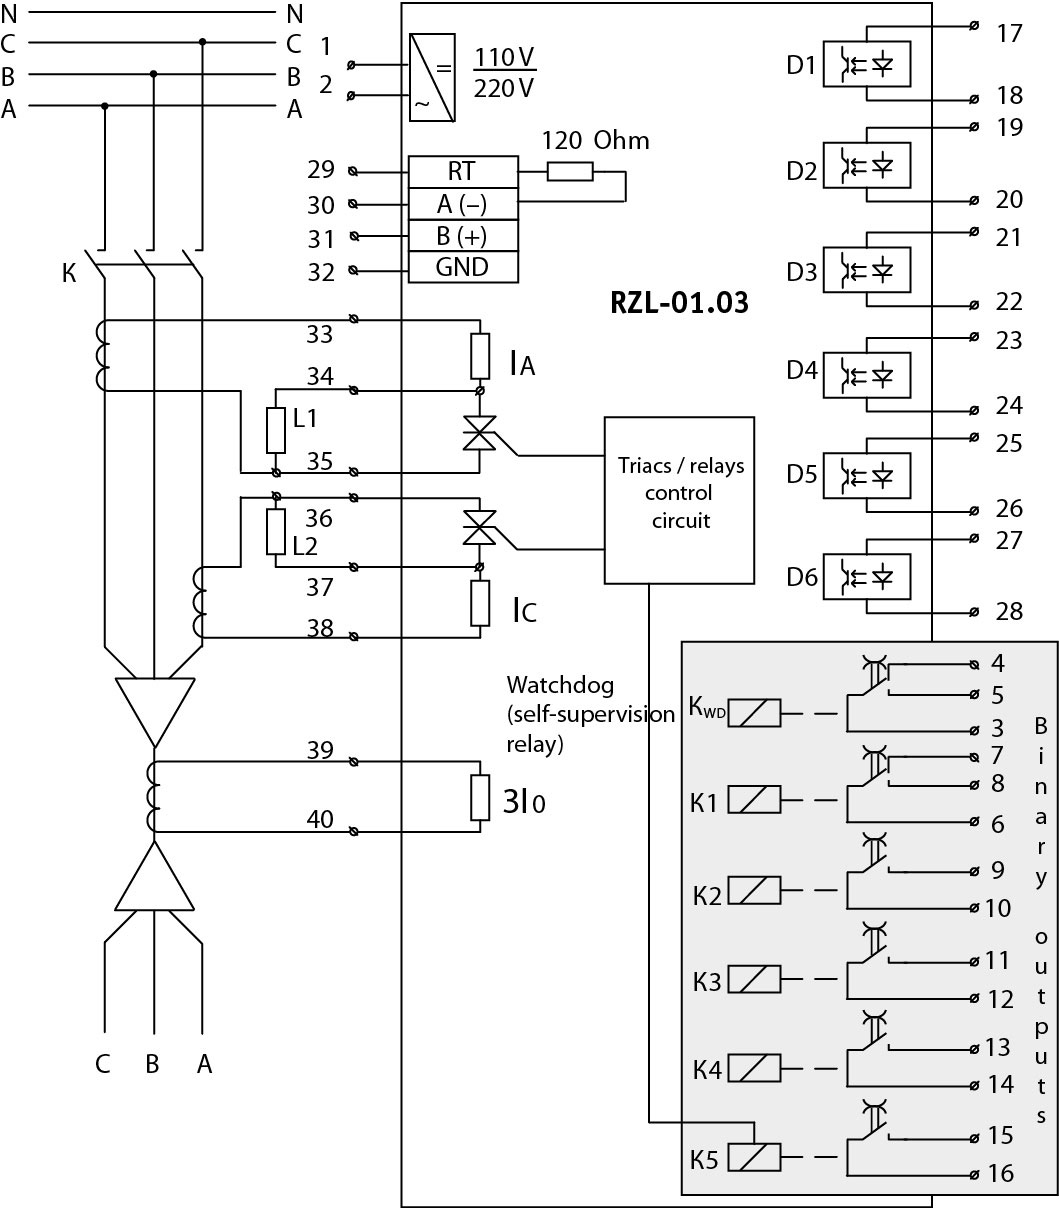 RZL-01.03 - wiring